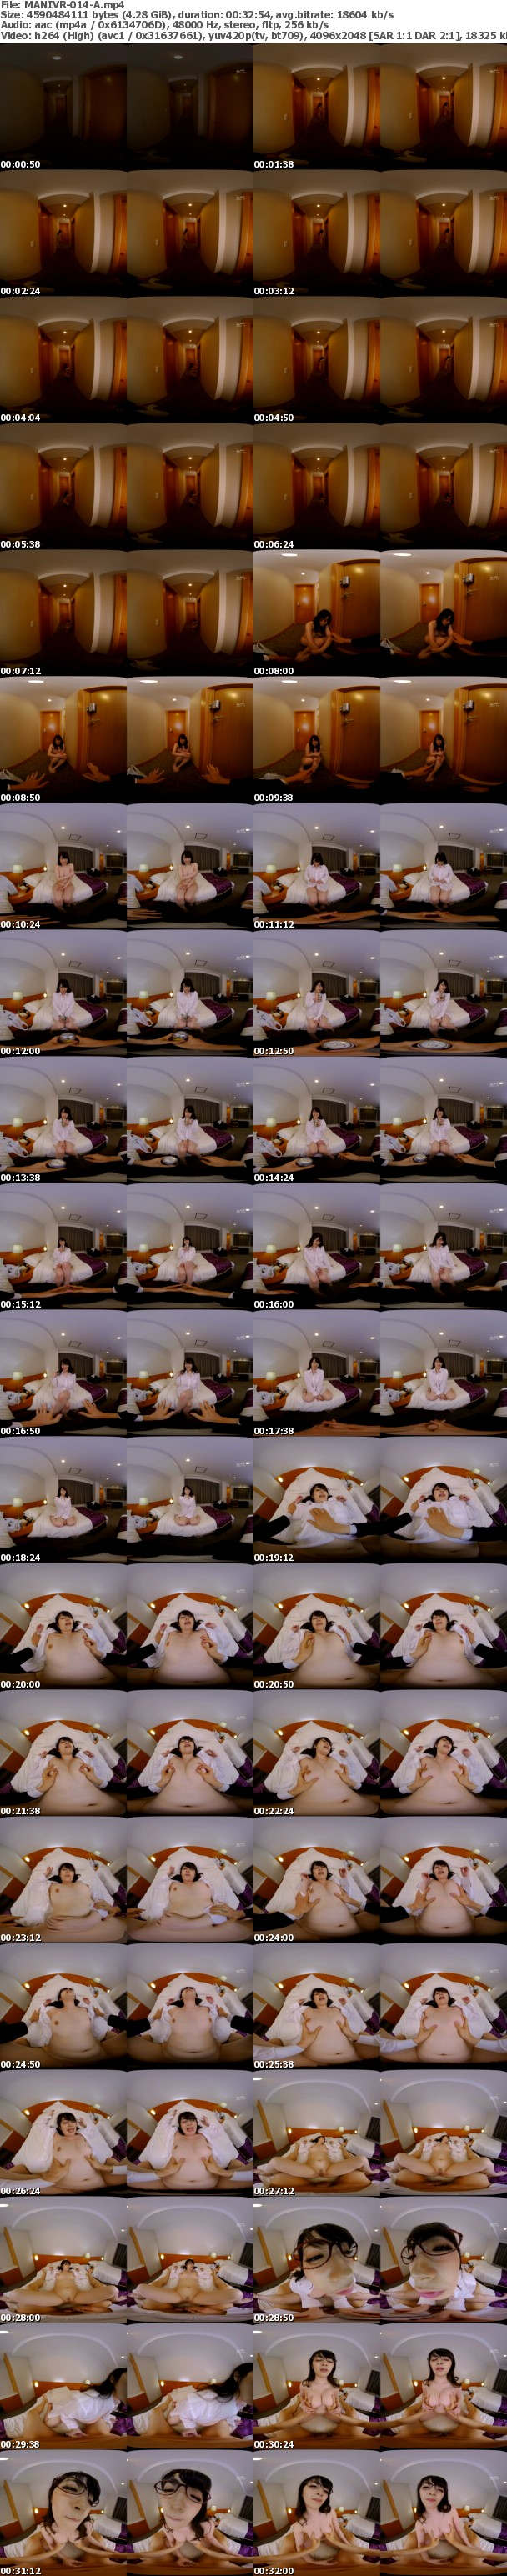 (VR) MANIVR-014 ビジネスホテルの廊下で部屋に入れない全裸女に遭遇 女は酔ってるからバレないかと我慢できず犯したら「これで終わりじゃないでしょ?」自らナマでねじ込み何度もオマ○コで精子を搾りとるド痴女に豹変